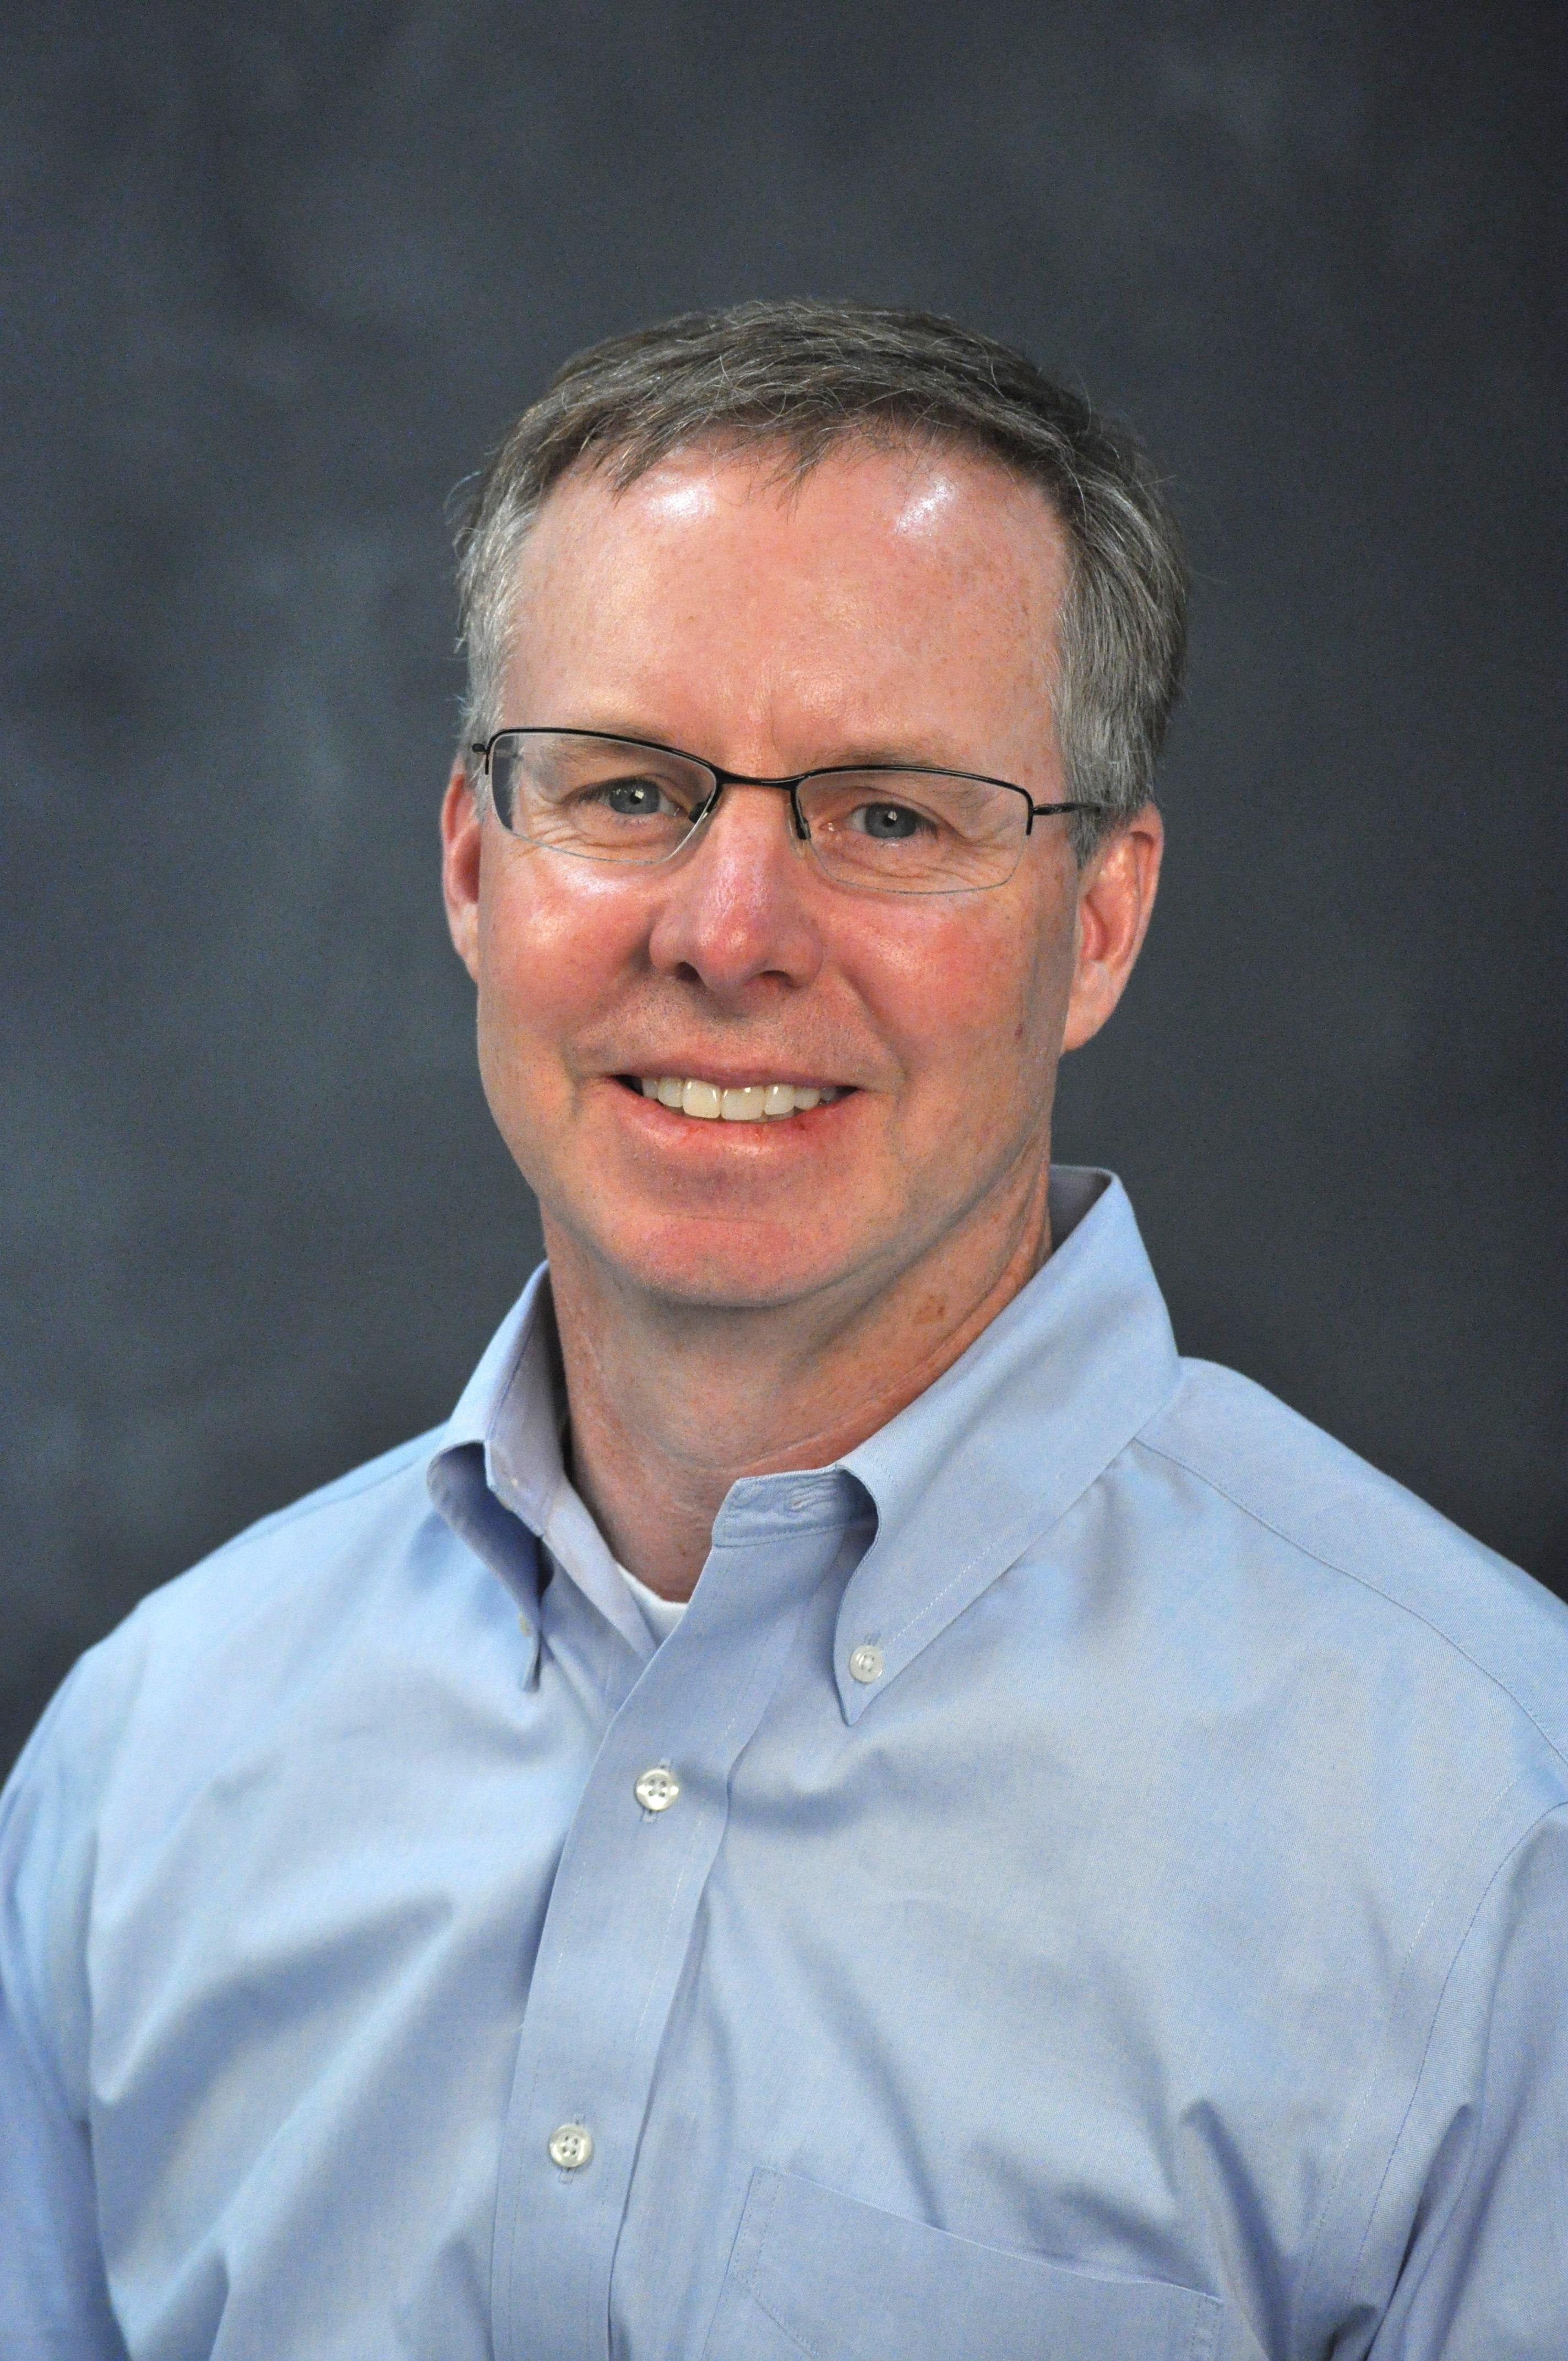 James McDaniel, MD